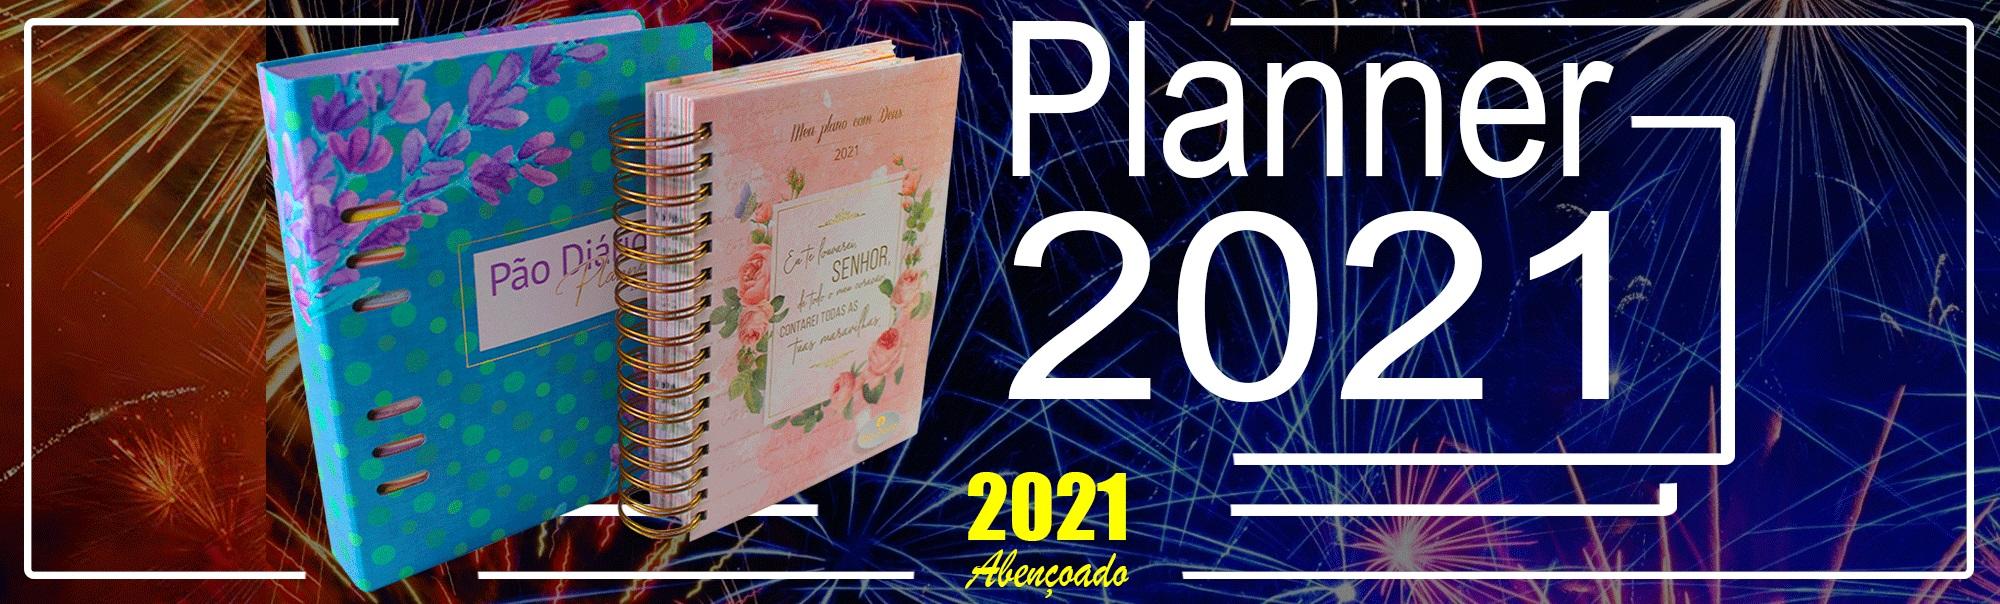 planner 2021 | livraria cristã emmerick